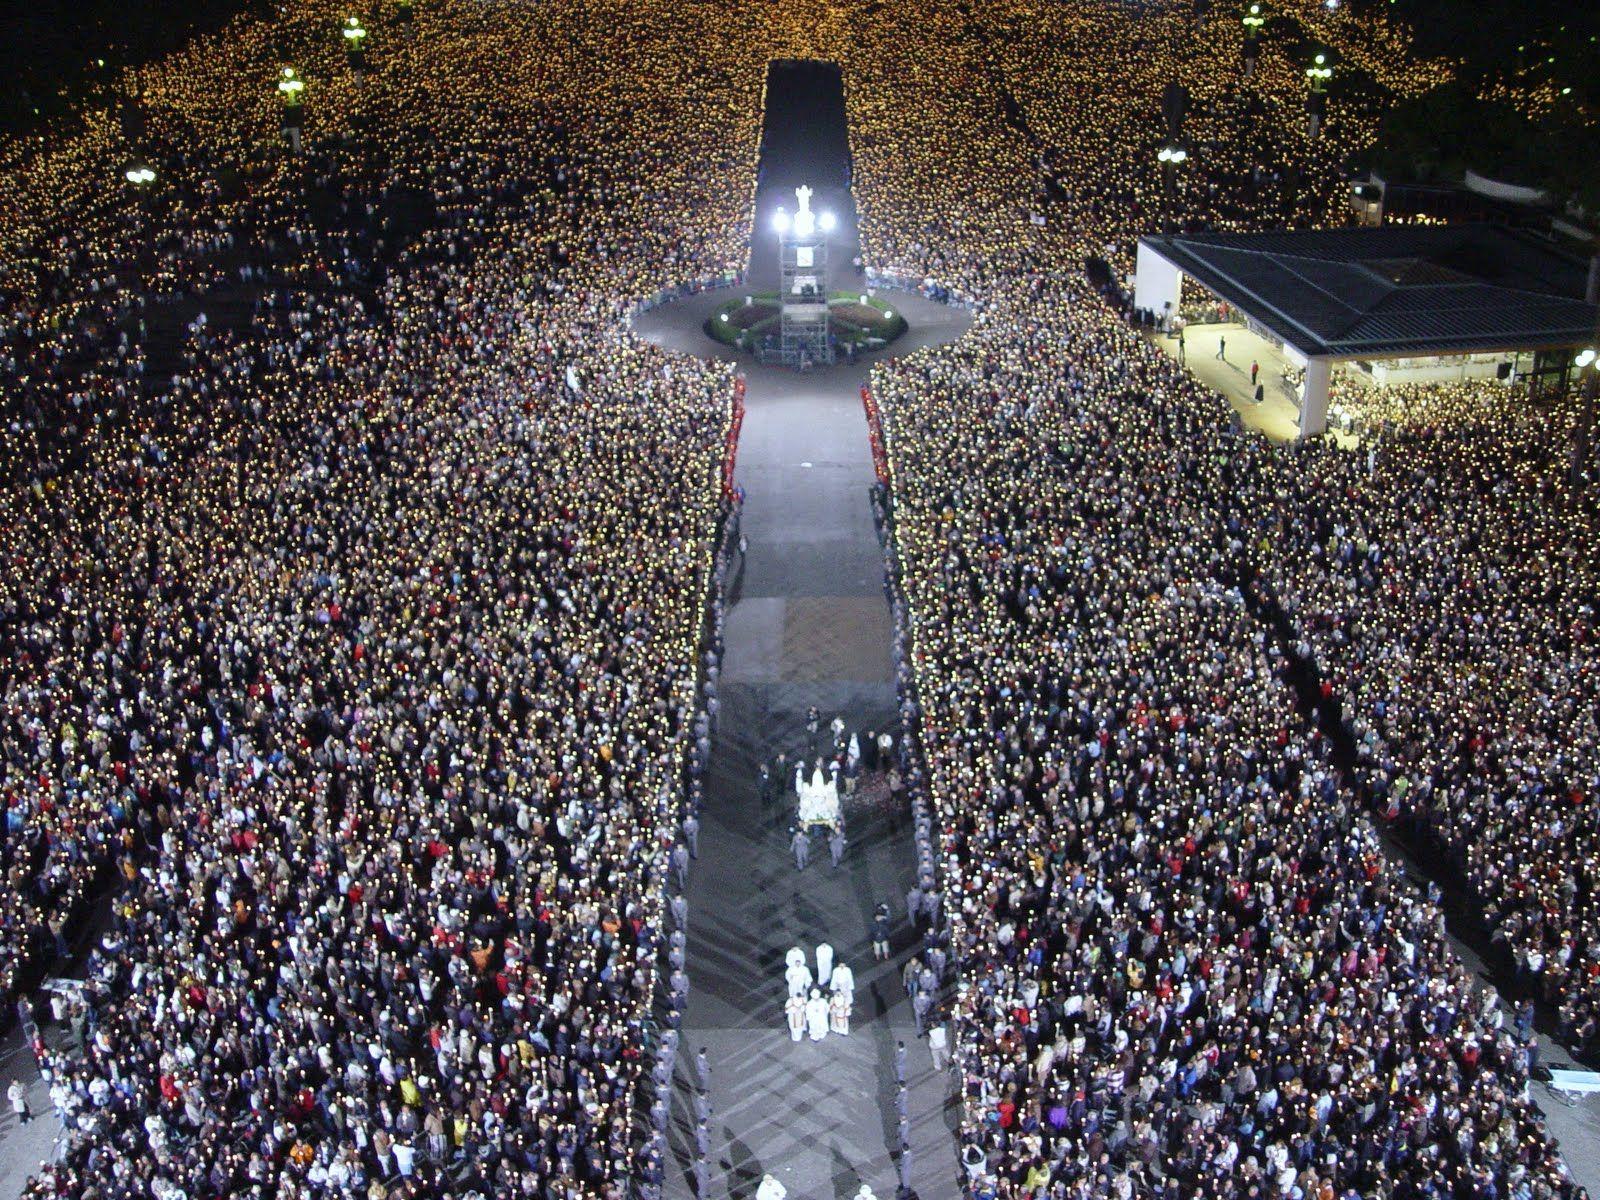 Procissão das velas. The candlelight procession. La procession aux chandelles.  #Fatima, #Portugal http://www.hoteldg.com/en/fatima